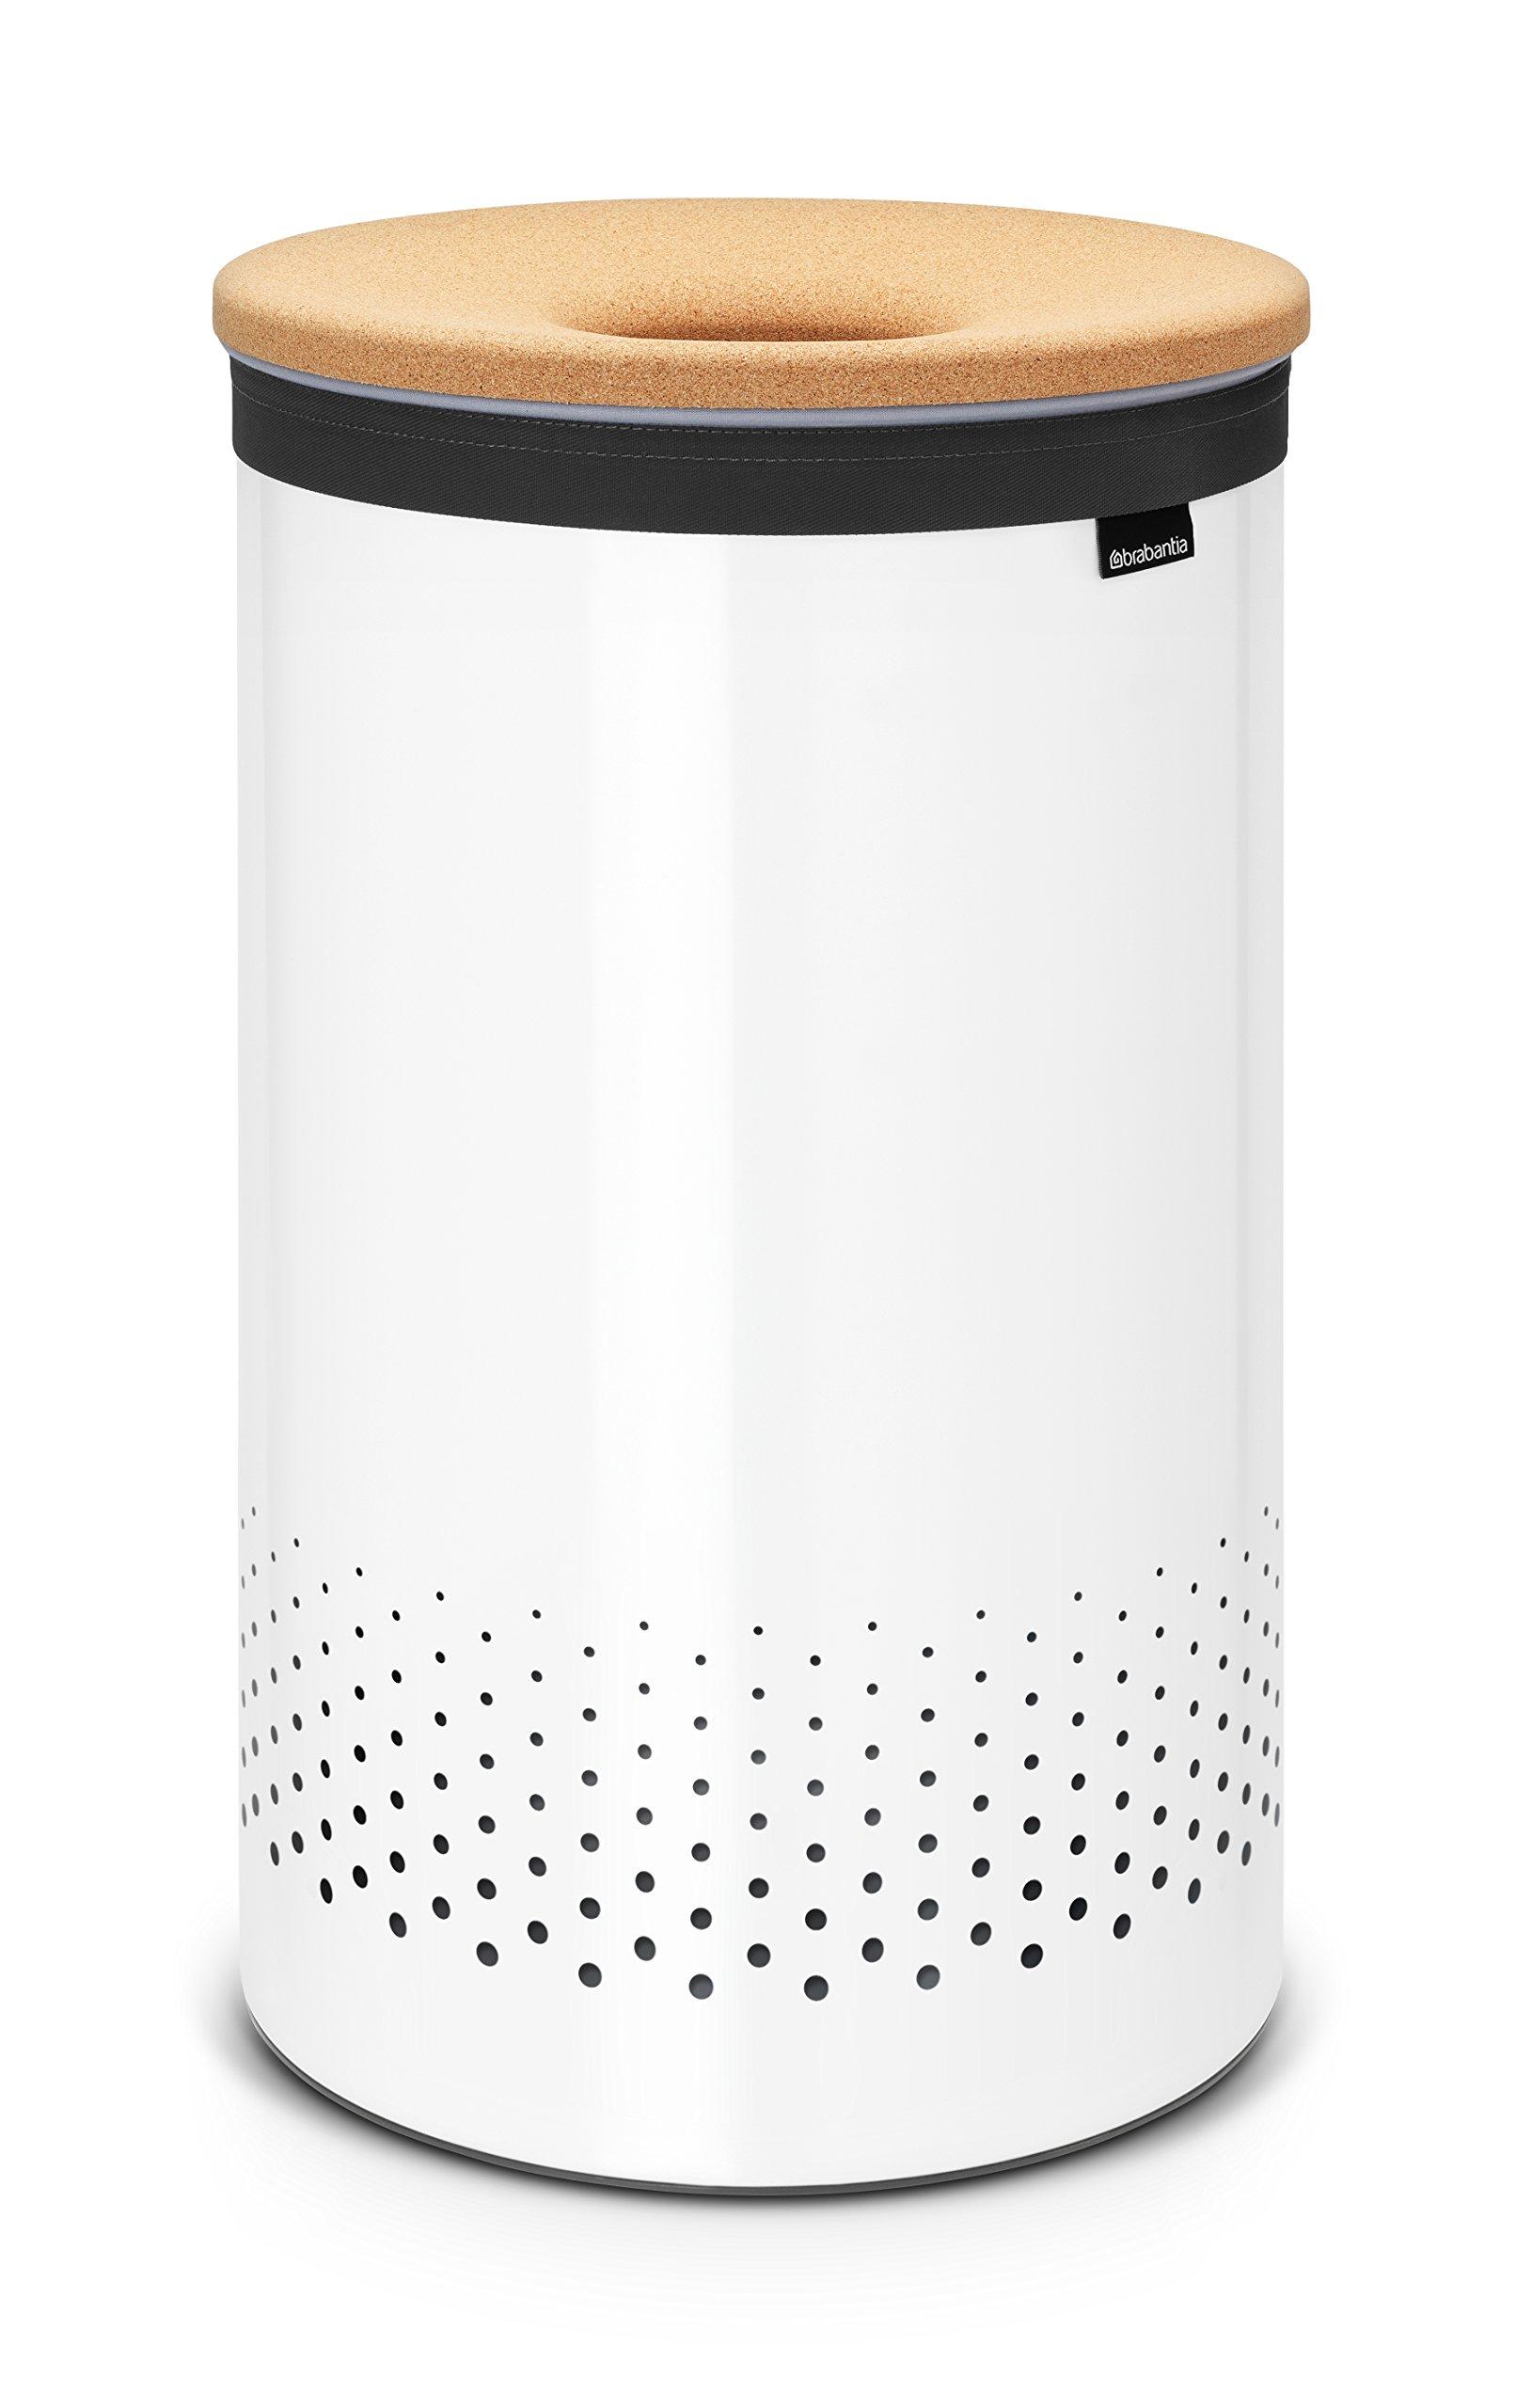 Brabantia Large Laundry Bin with Cork Lid, 16 Gallon (60L) White by Brabantia